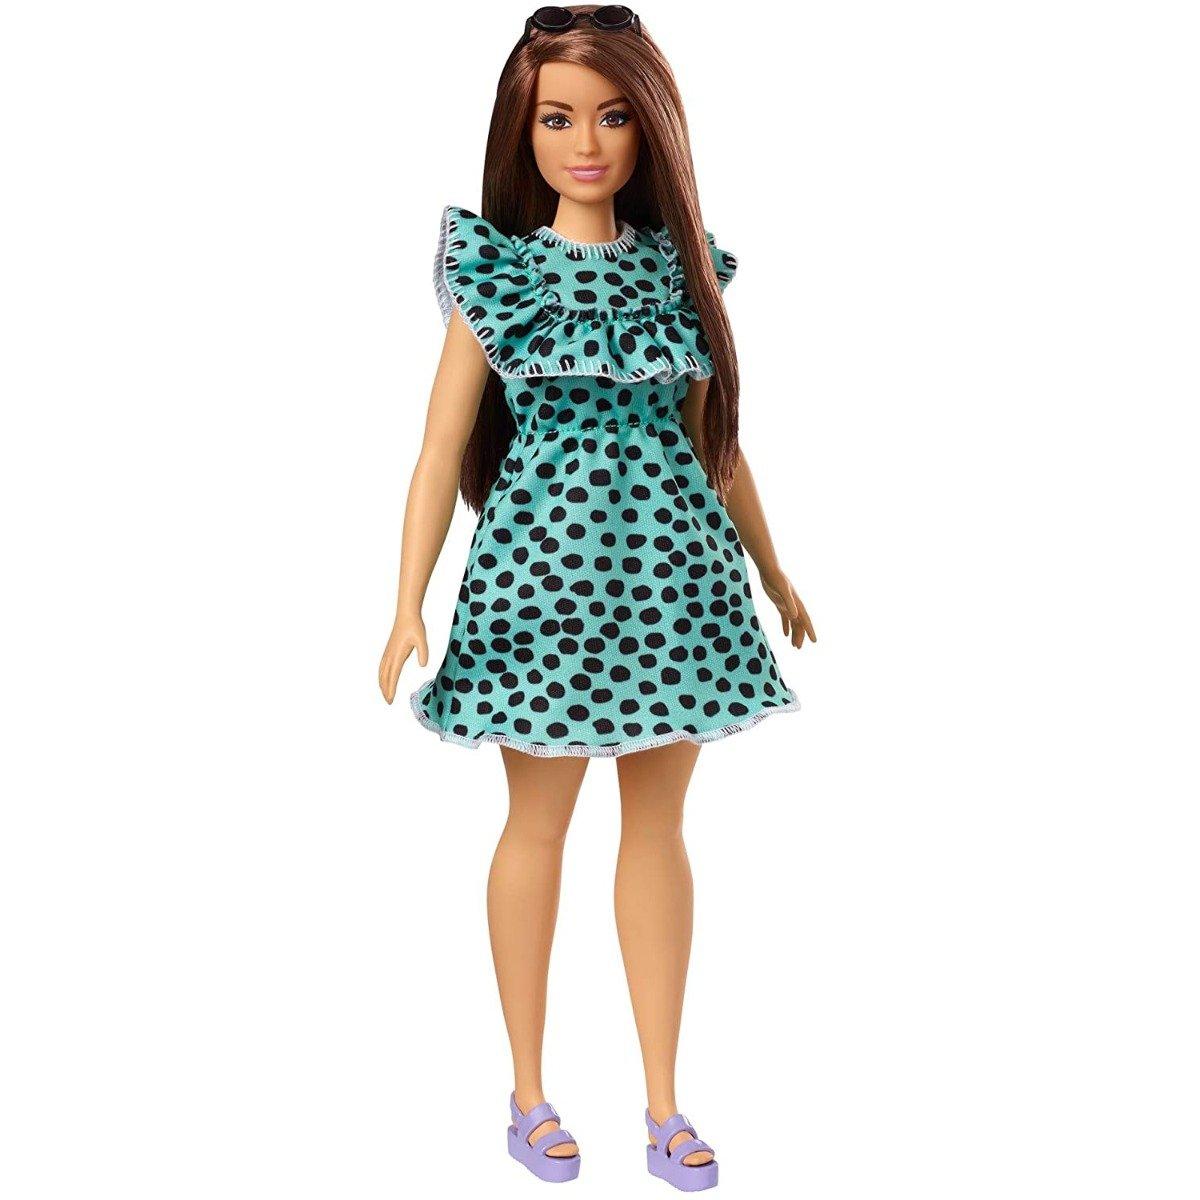 Papusa Barbie Fashionistas, 149 GHW63 imagine